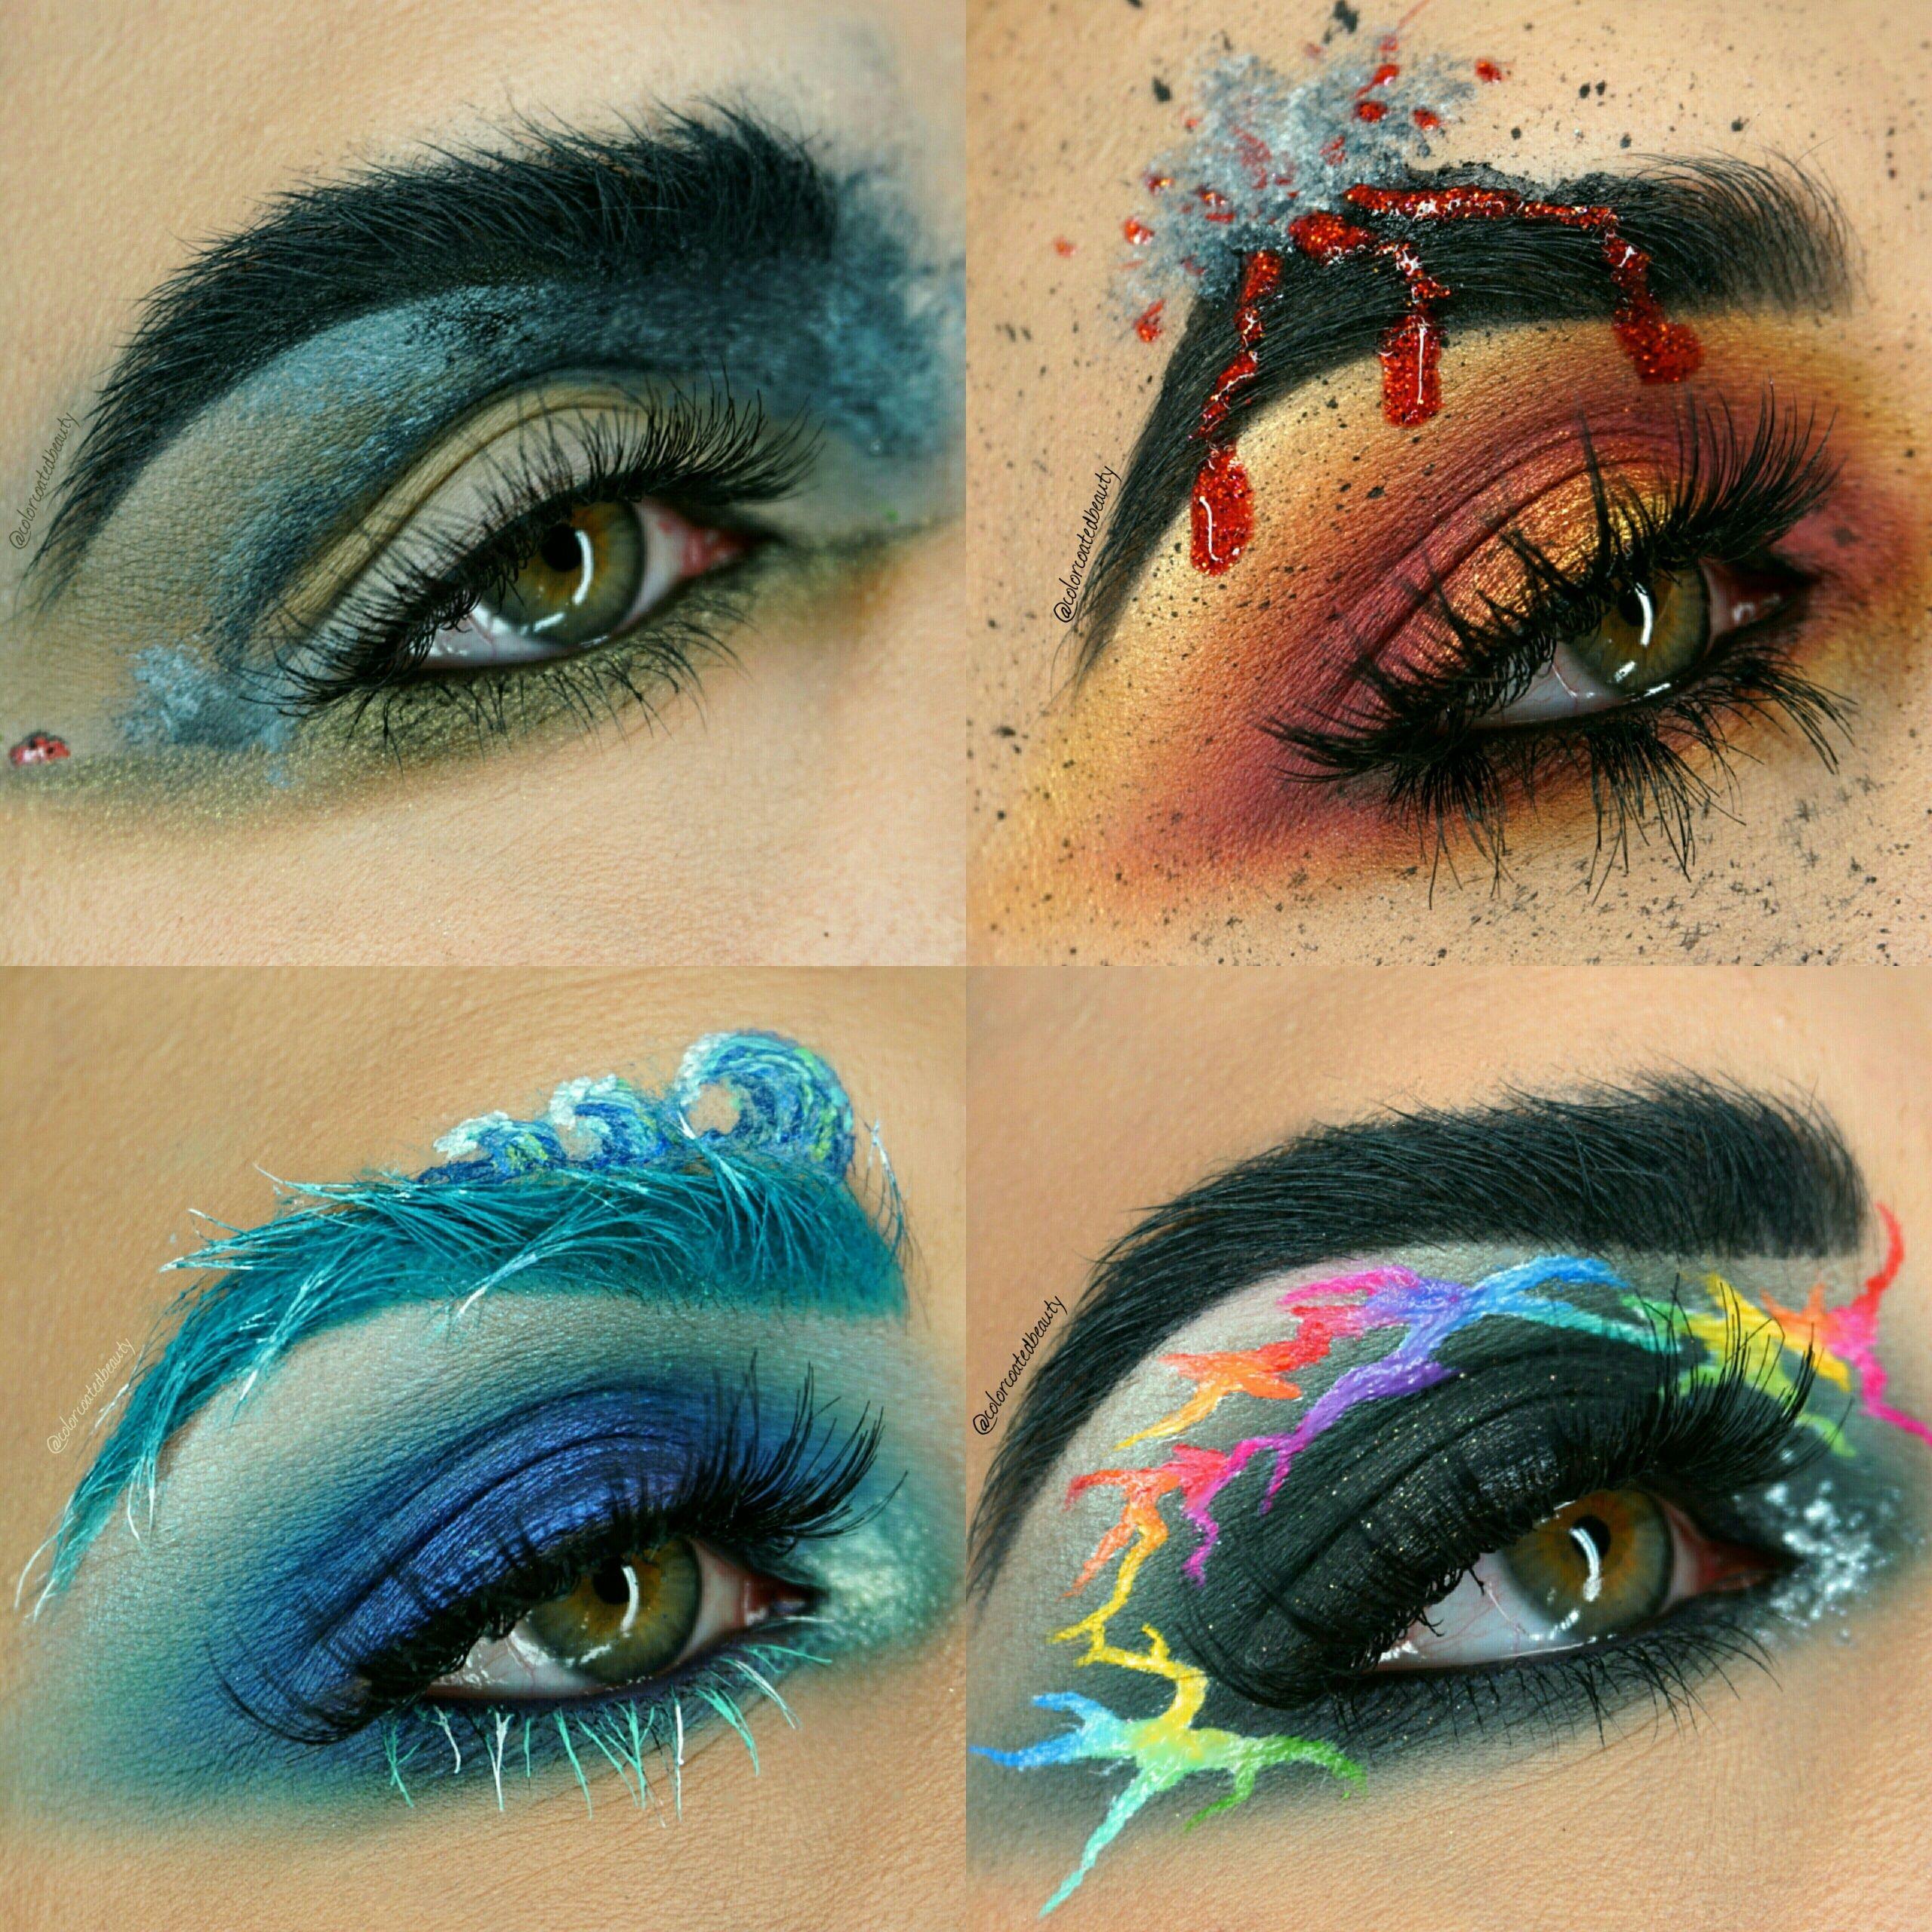 VOLCANO Makeup Tutorial (With images) Makeup geek